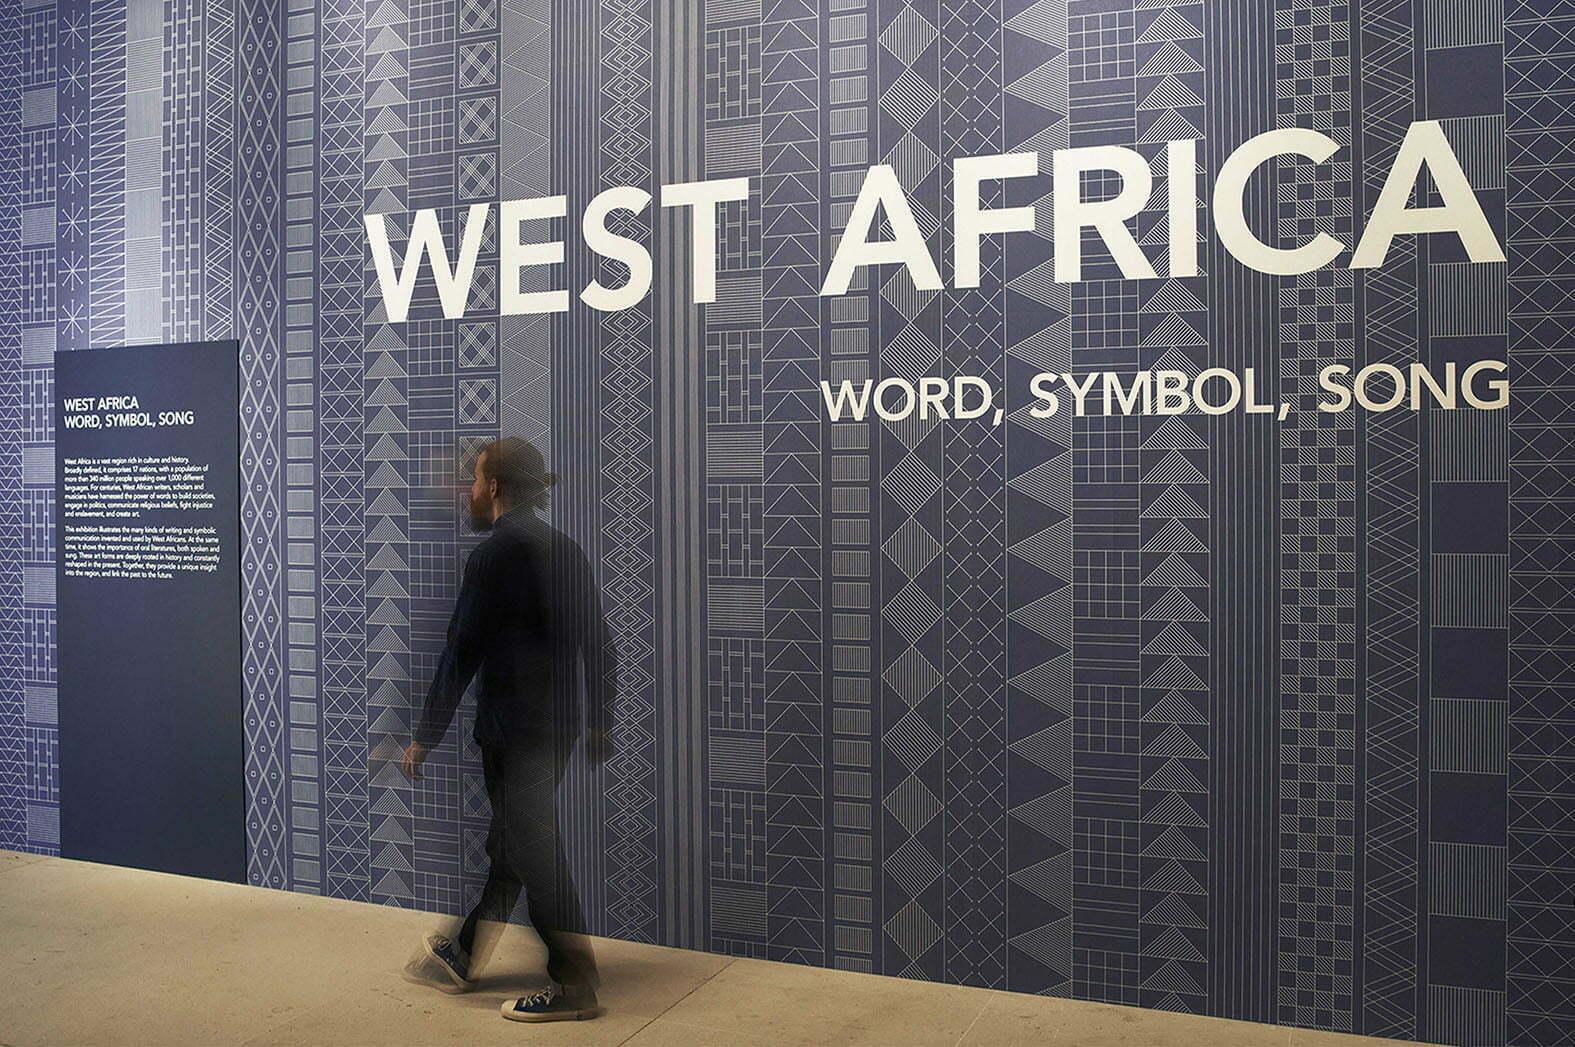 01_Lombaert_Studio_British_Library_West_Africa_07